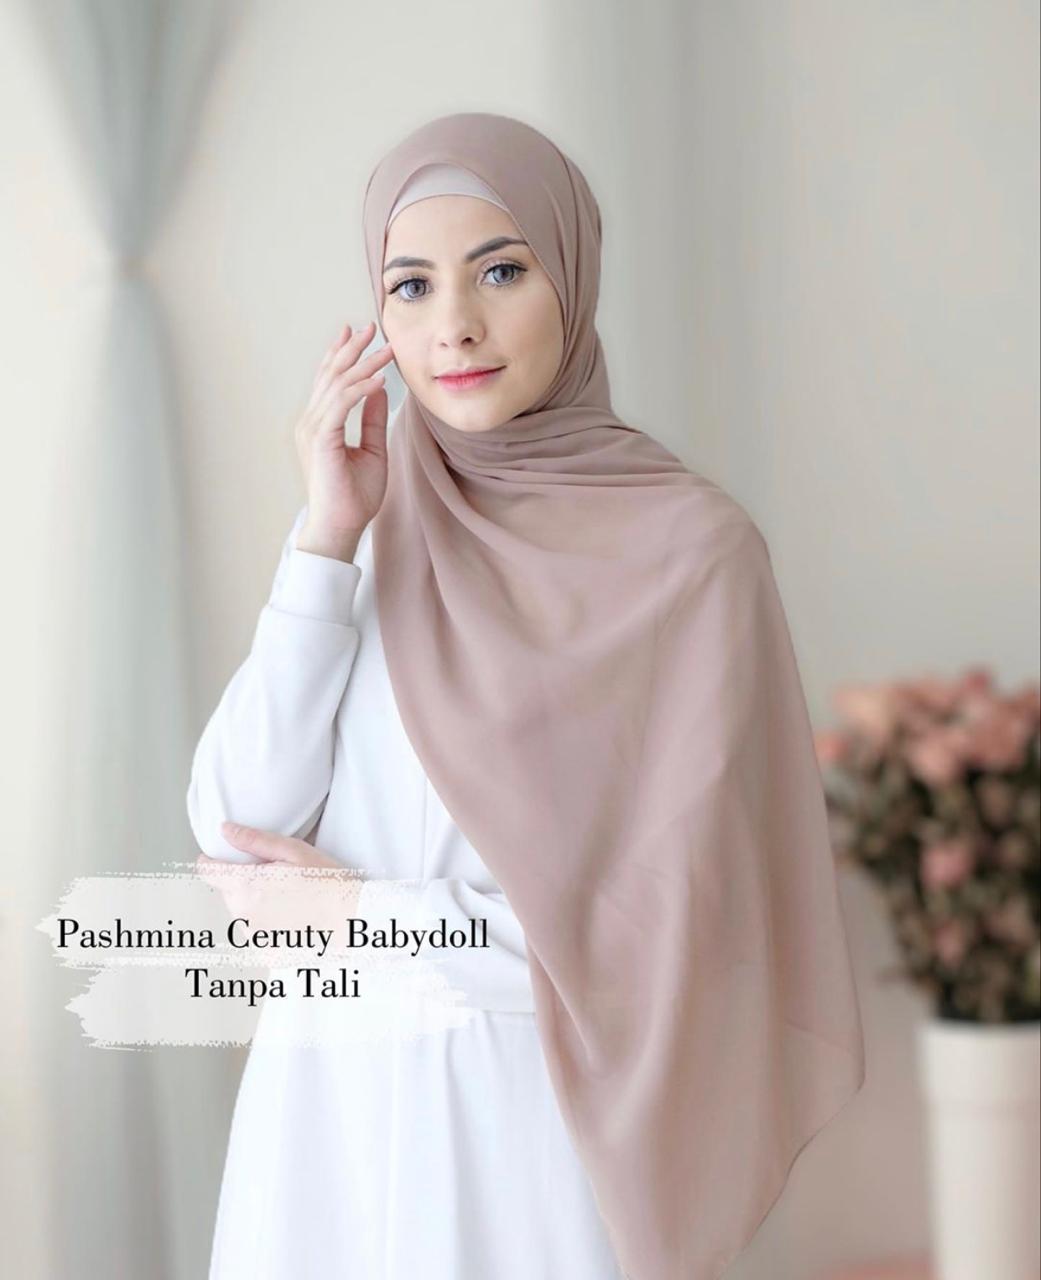 Vvv Fashion Kerudung Pashmina Ceruti Baby Doll Pasmina Ceruty Baby Doll Jilbab Perempuan Gadis Remaja Wanita Tanpa Tali Murah Panjang 2020 Terbaru Kekinian Cod Bisa Bayar Di Tempat Hijab Terbaru 2020